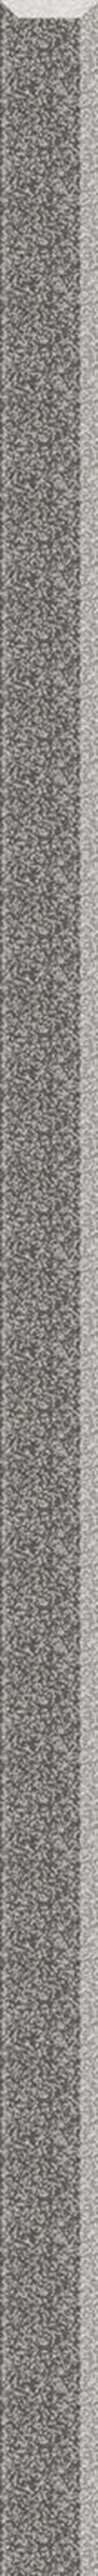 Paradyż Uniwersalna Listwa Szklana Grafit Brokat